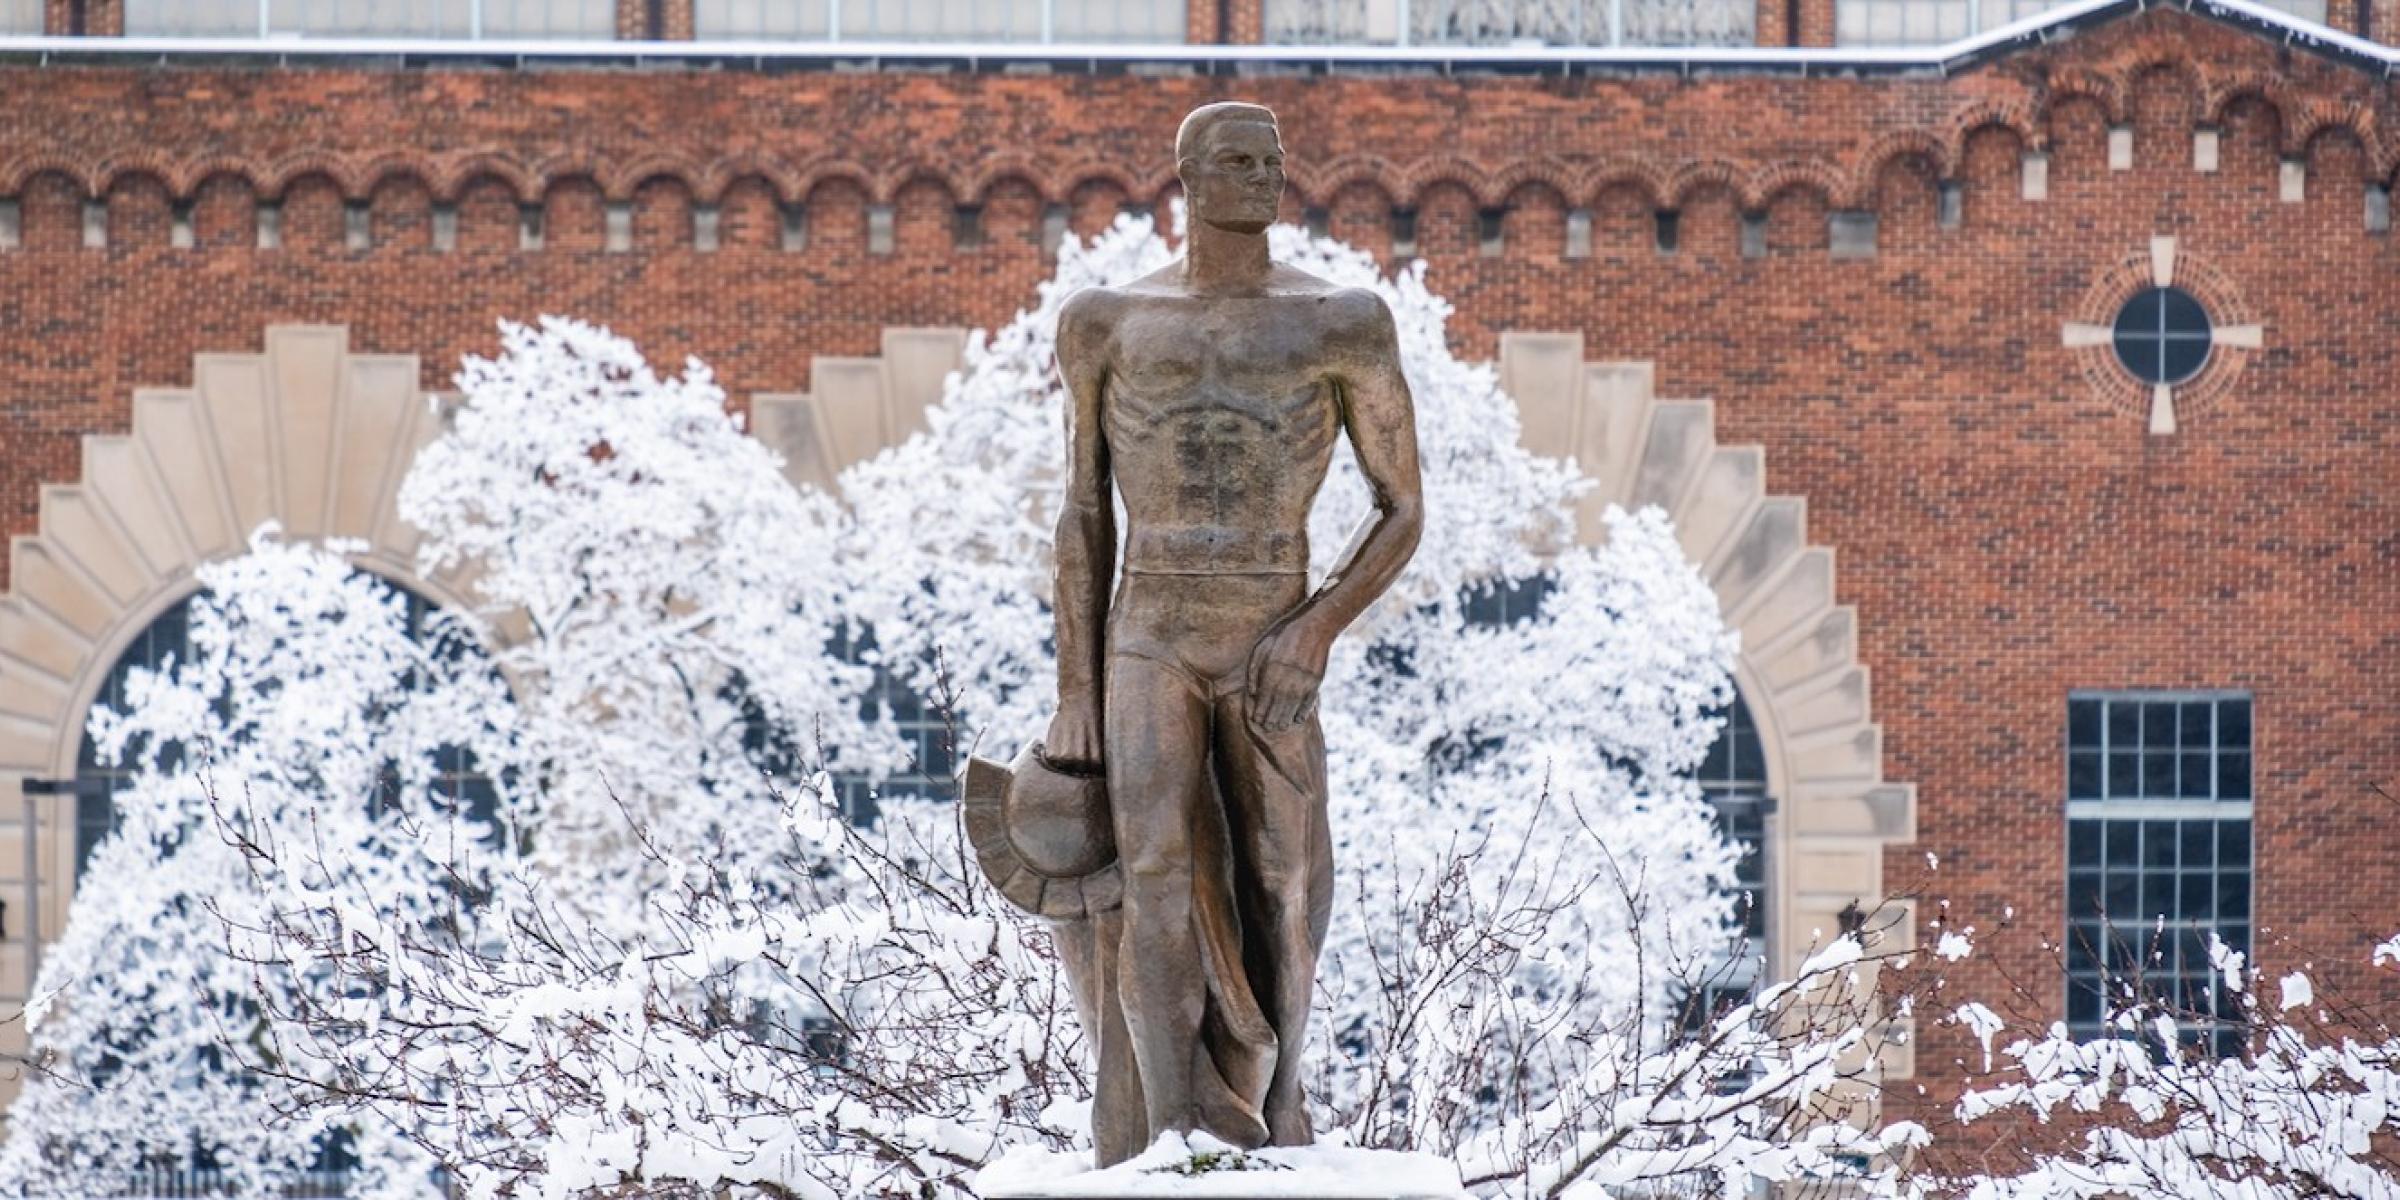 Sparty statue in snowy scene